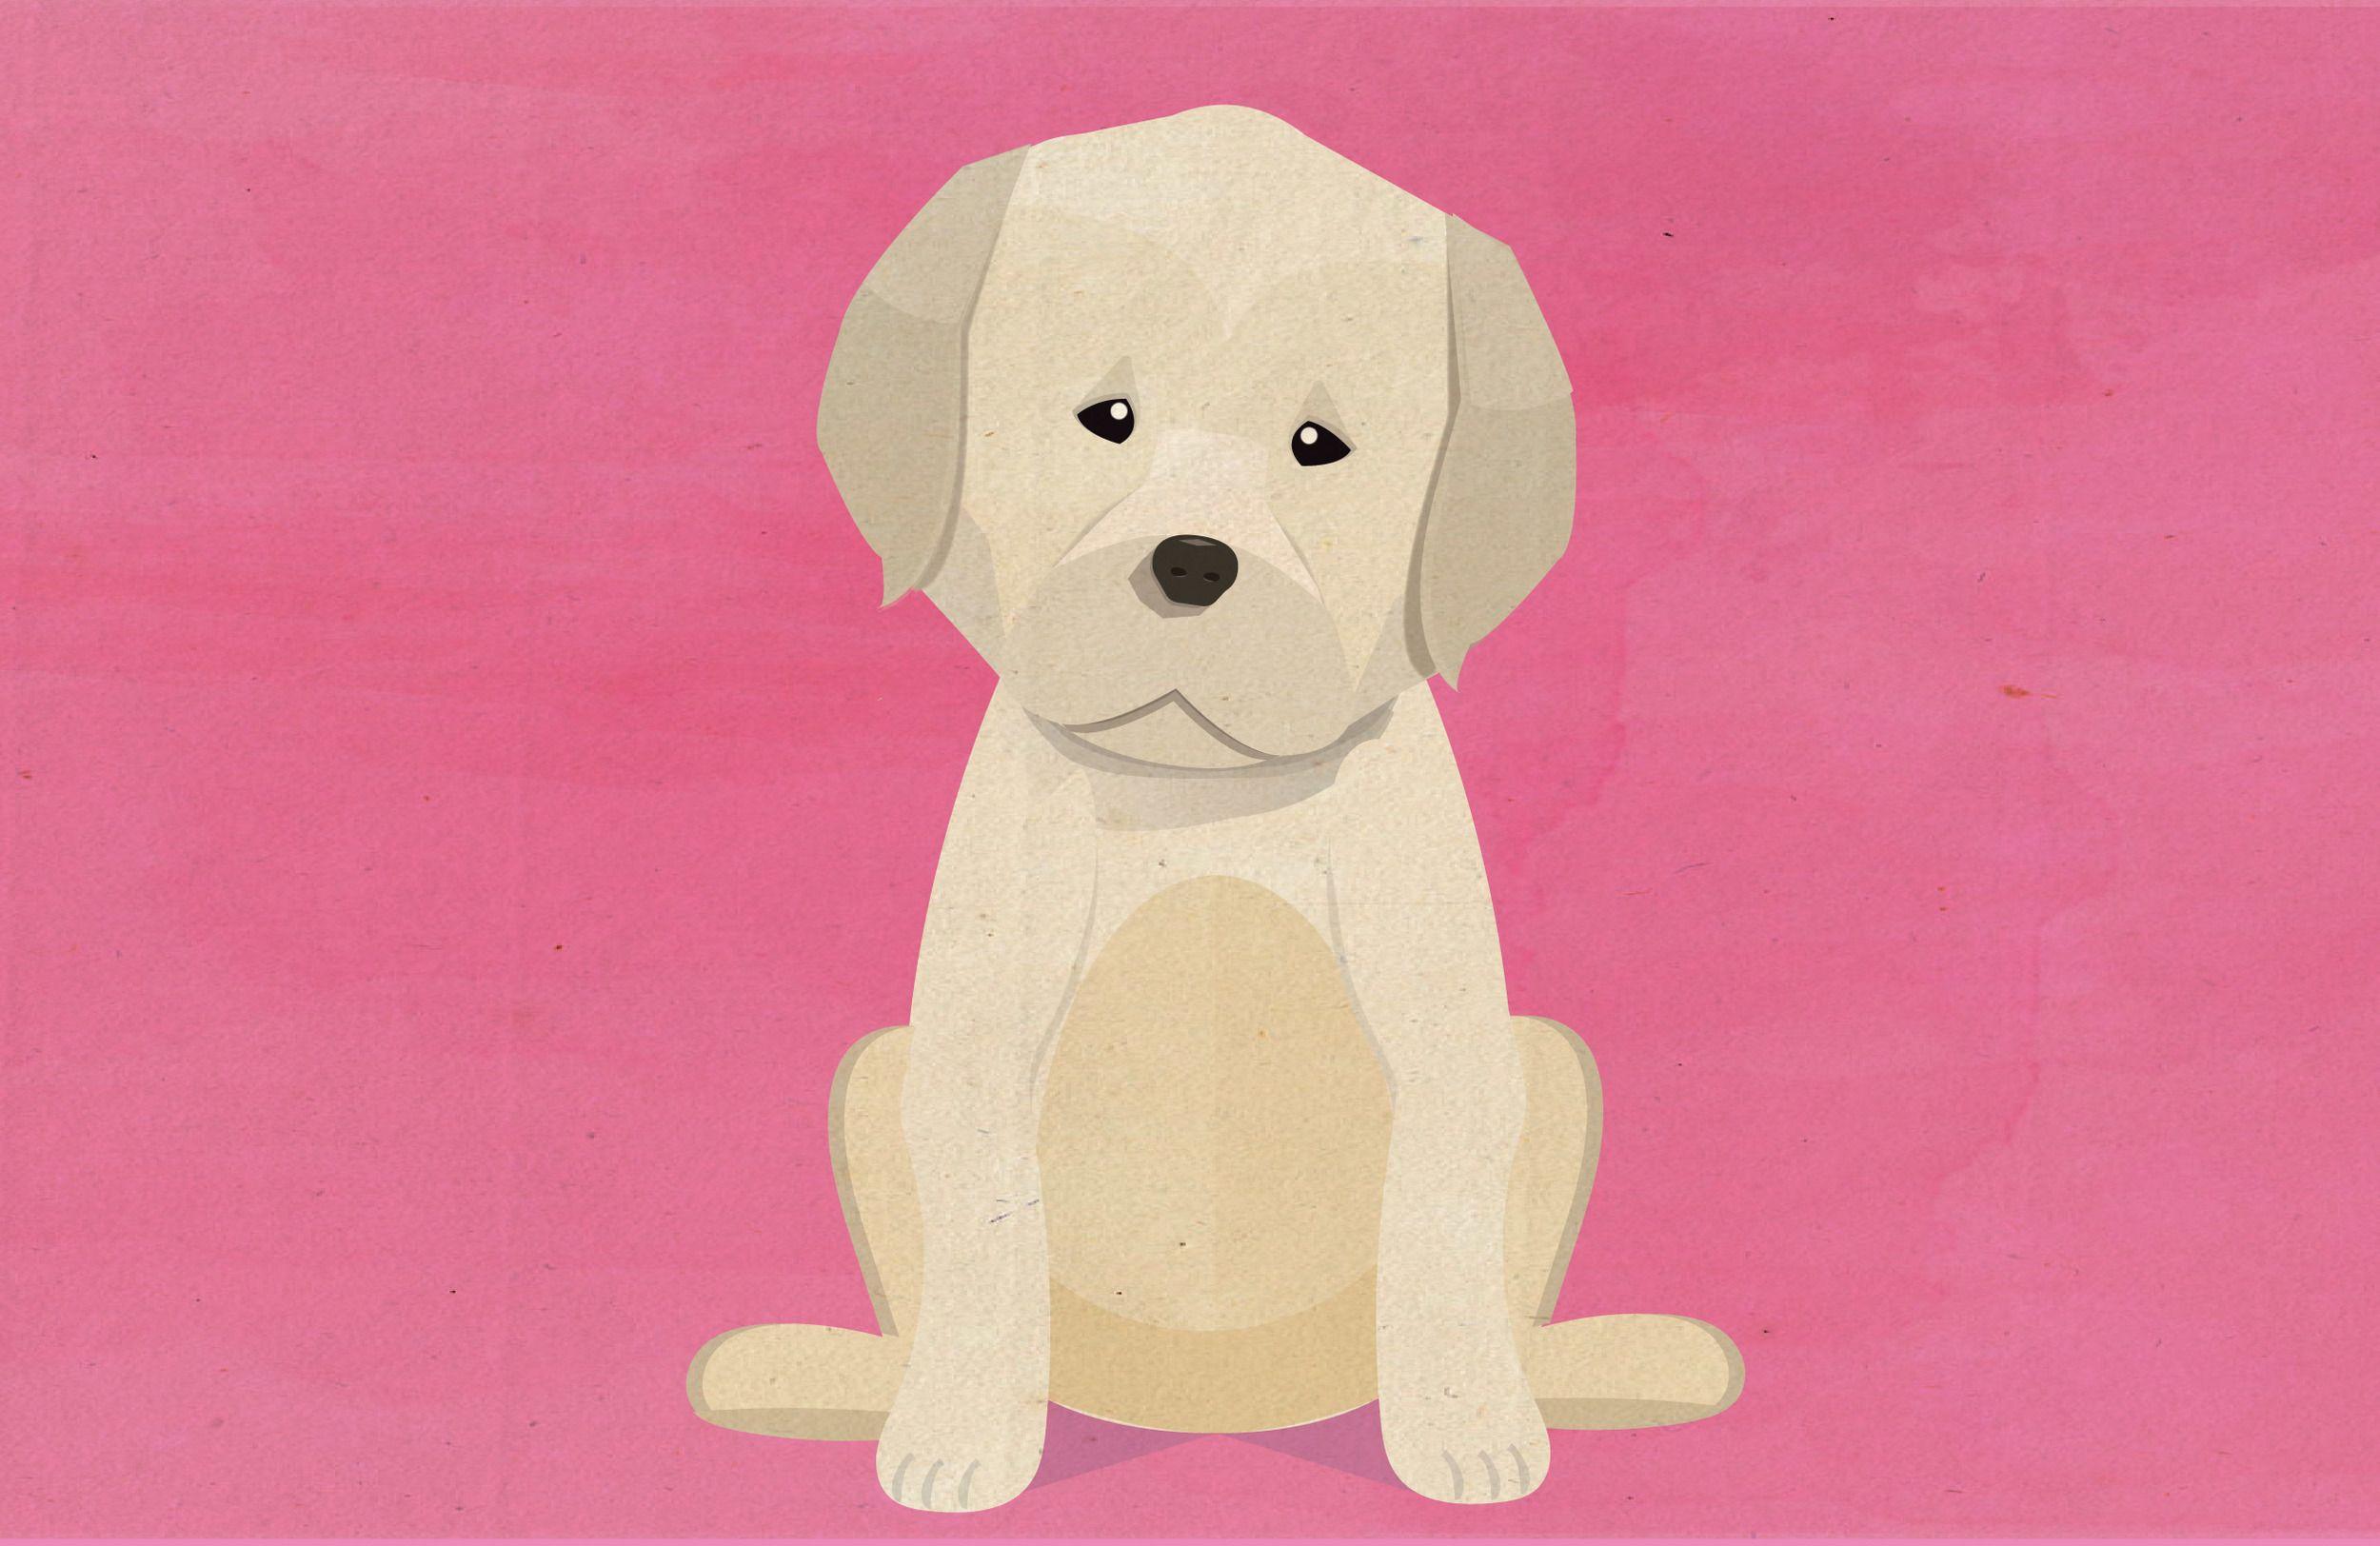 Labrador - Using Textures with Vectors